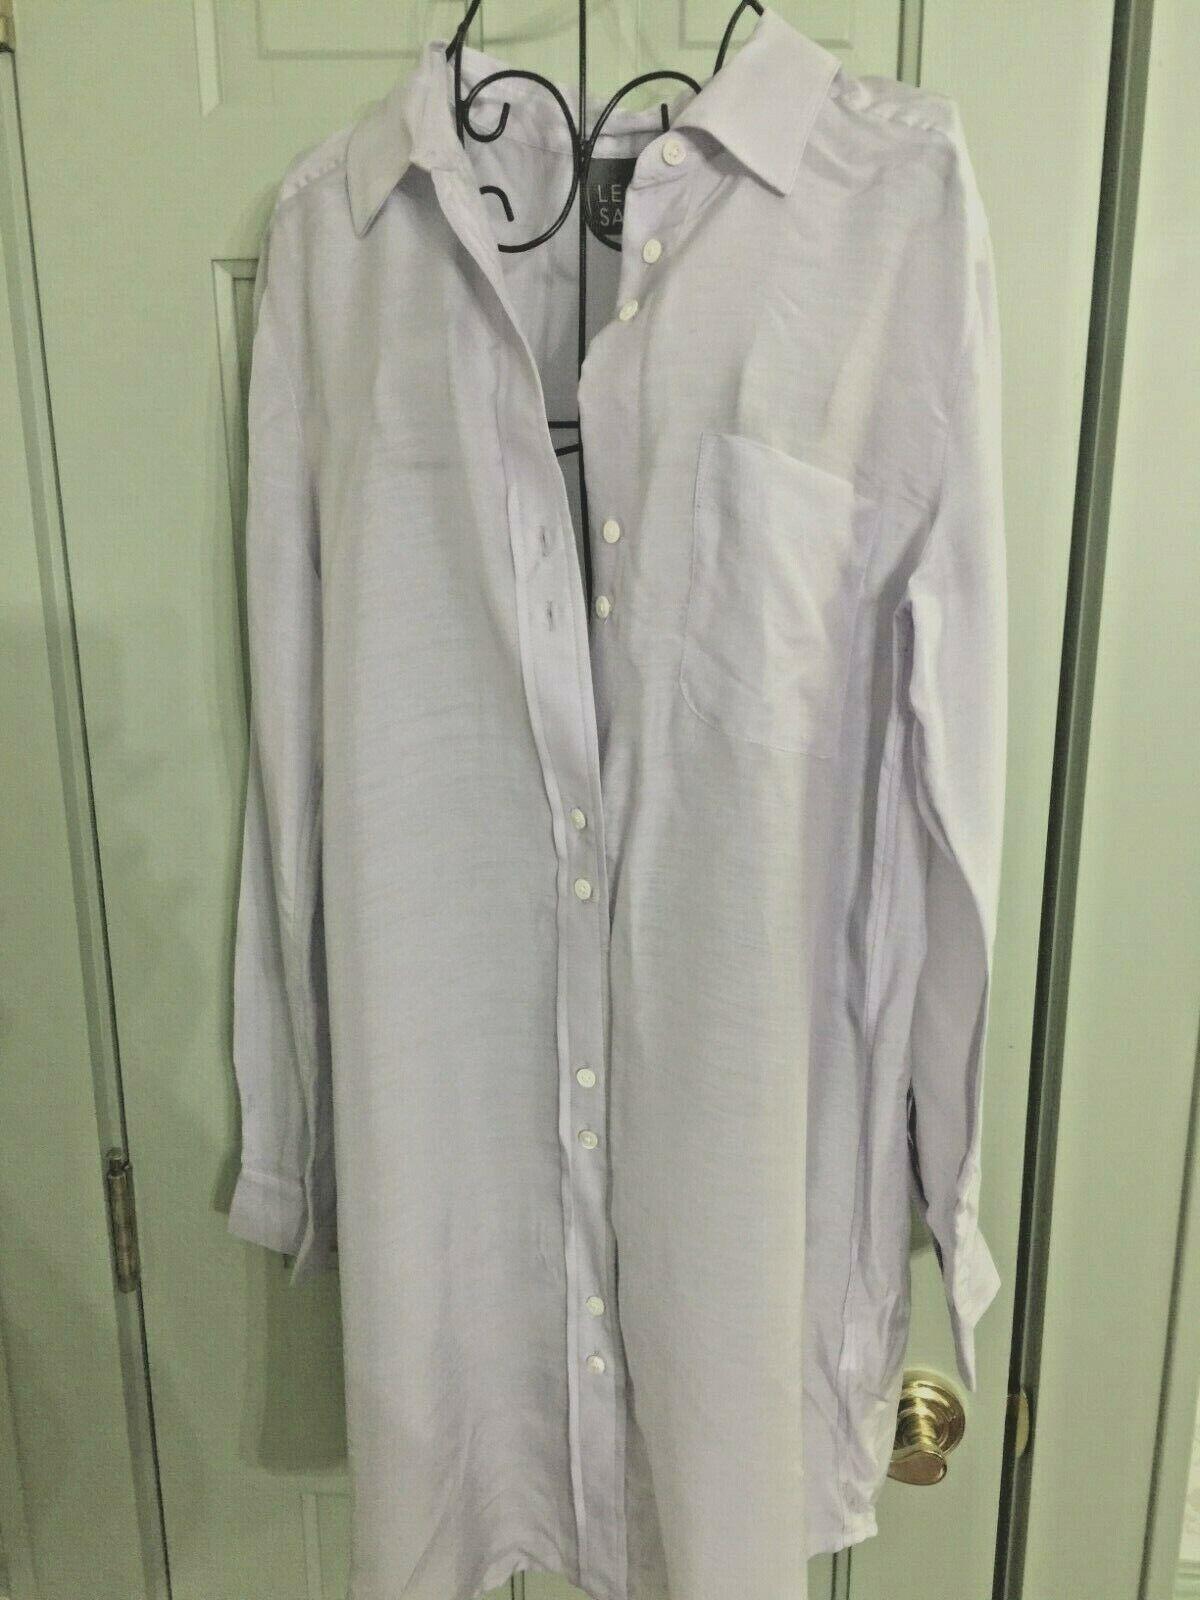 lila Lilac Shirt Top Blouse Tunic Shirtdress Button Down L NWT